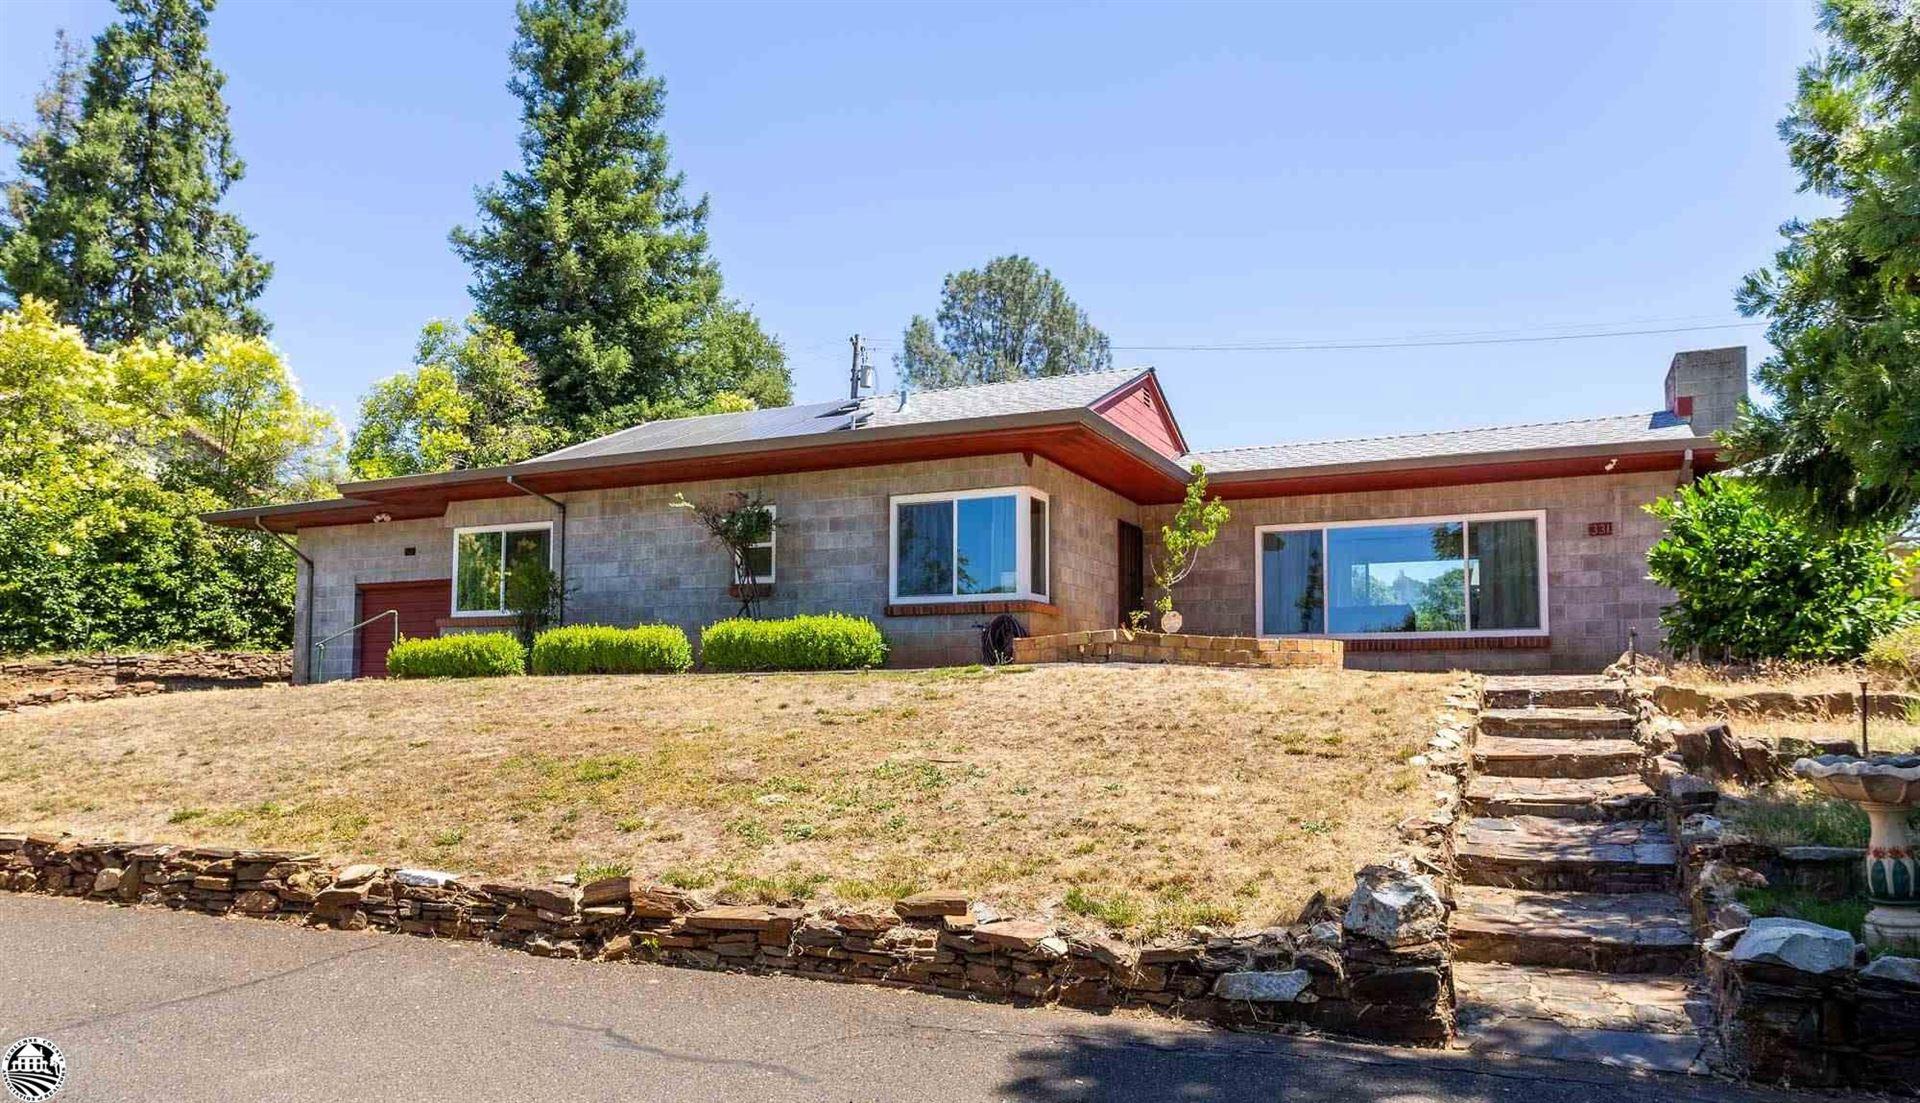 331 Knowles Hill, Sonora, CA 95370 - MLS#: 20200988